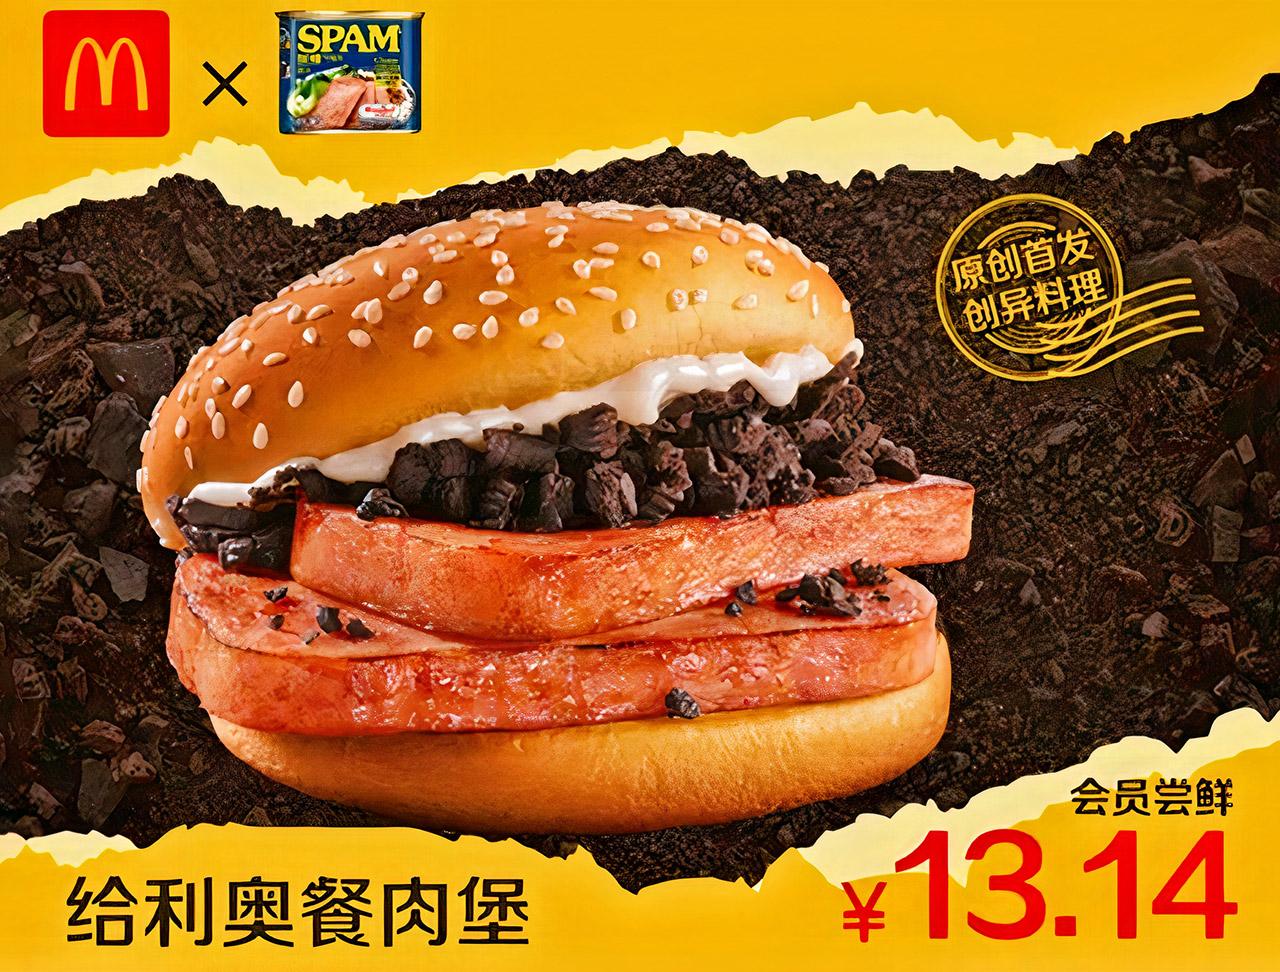 McDonalds China Oreo SPAM Burger